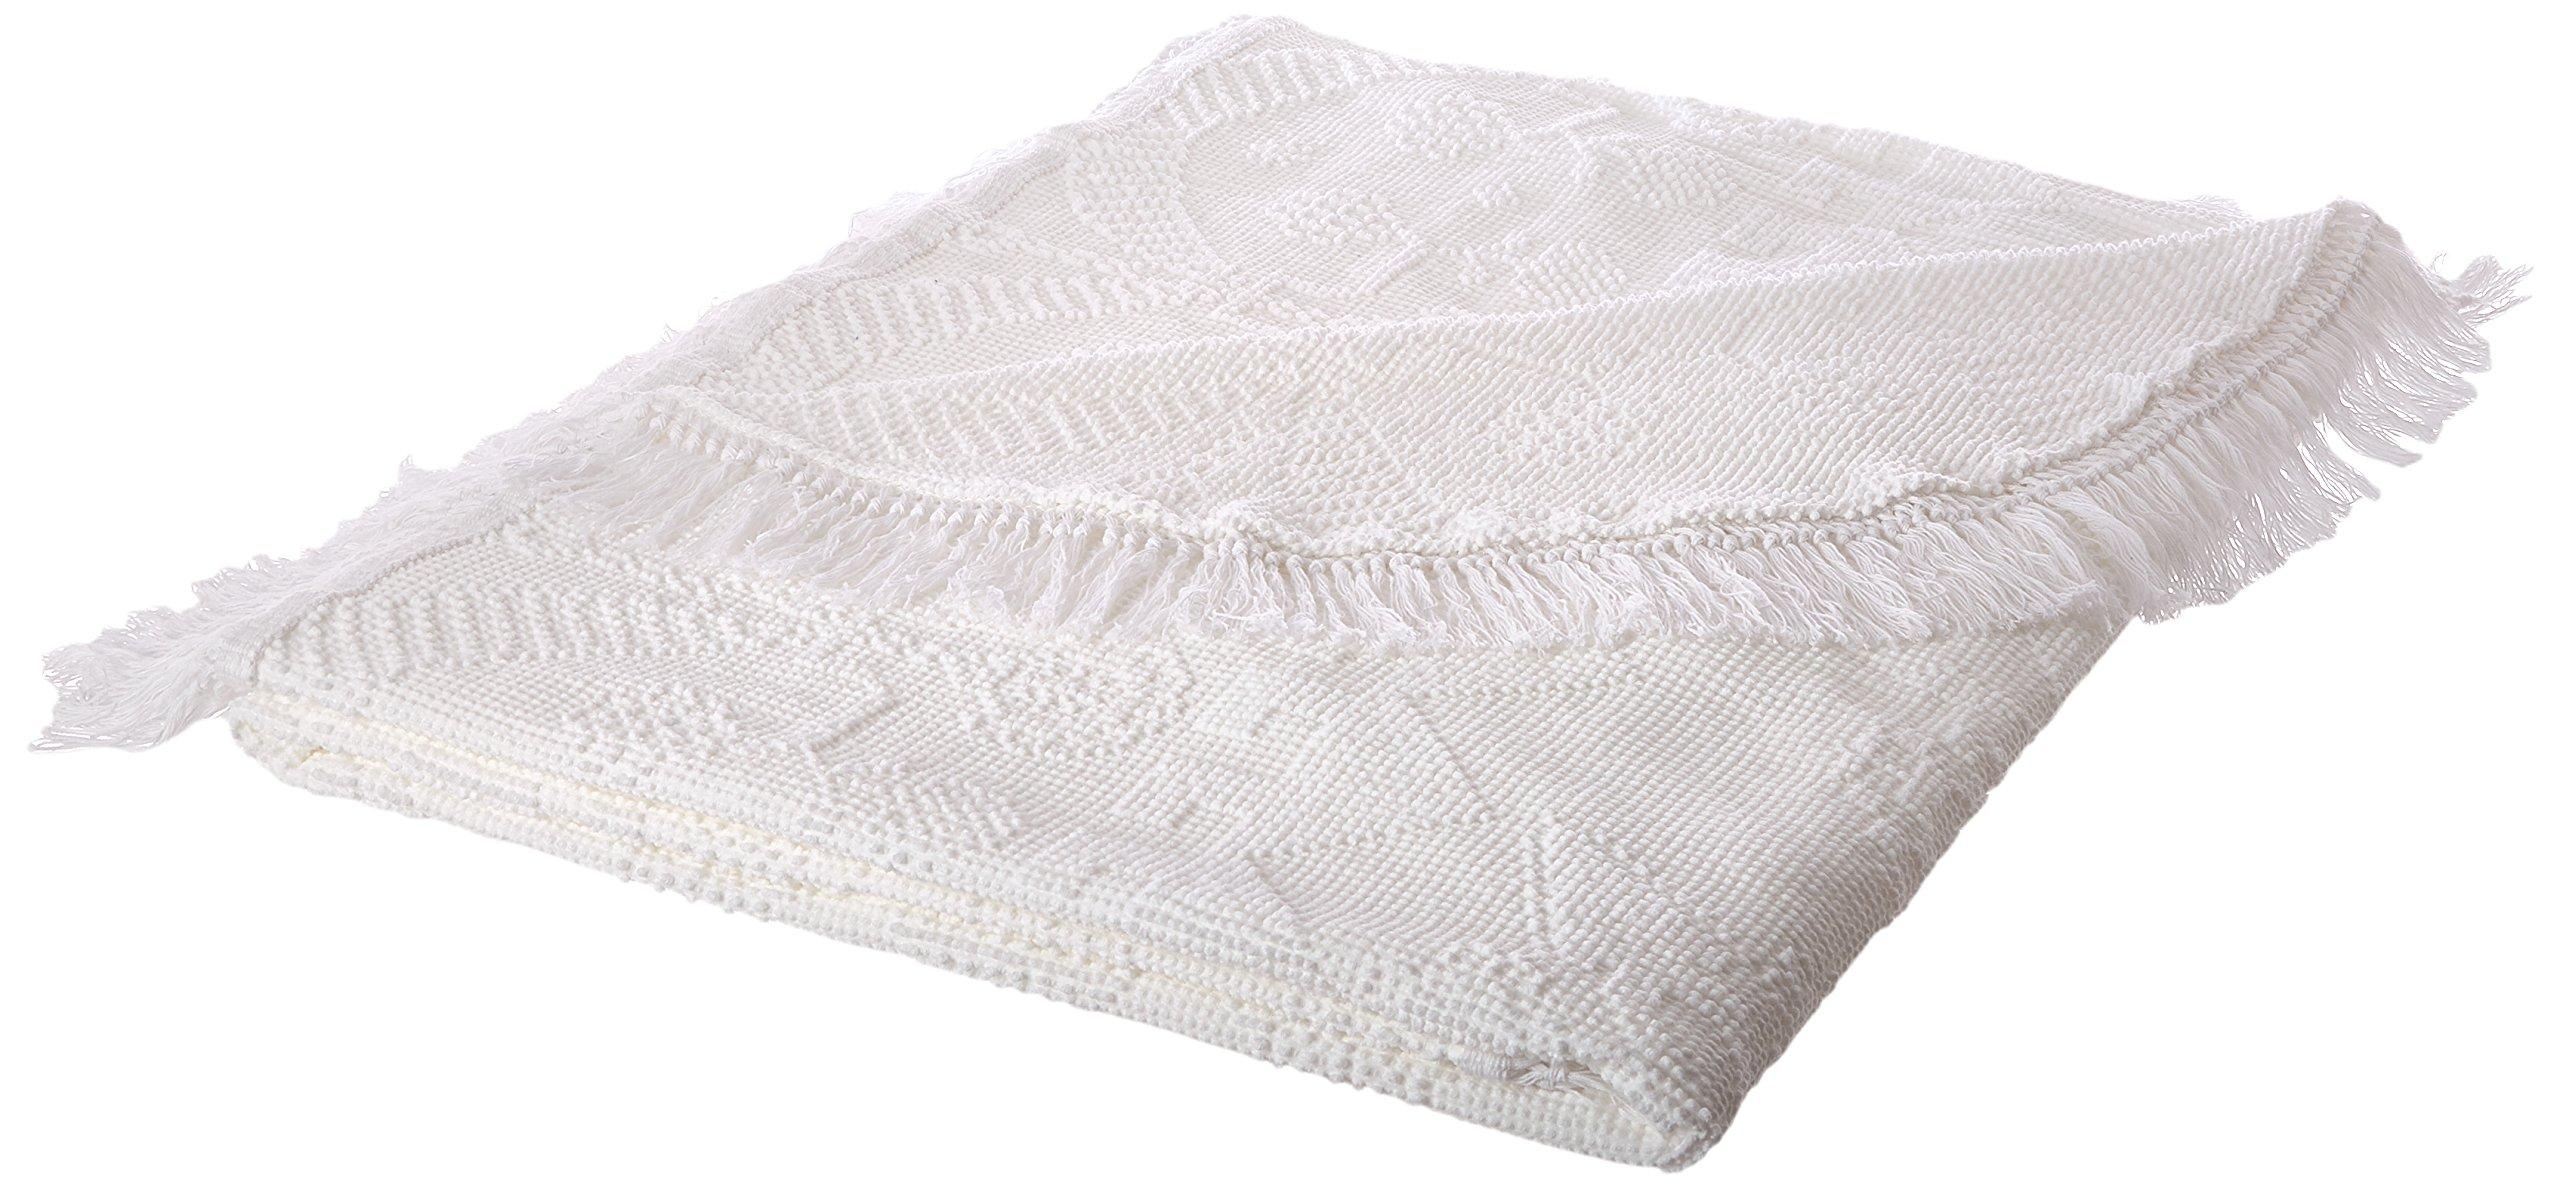 Martha Washington's Choice Bedspread - King - White - with String Fringe